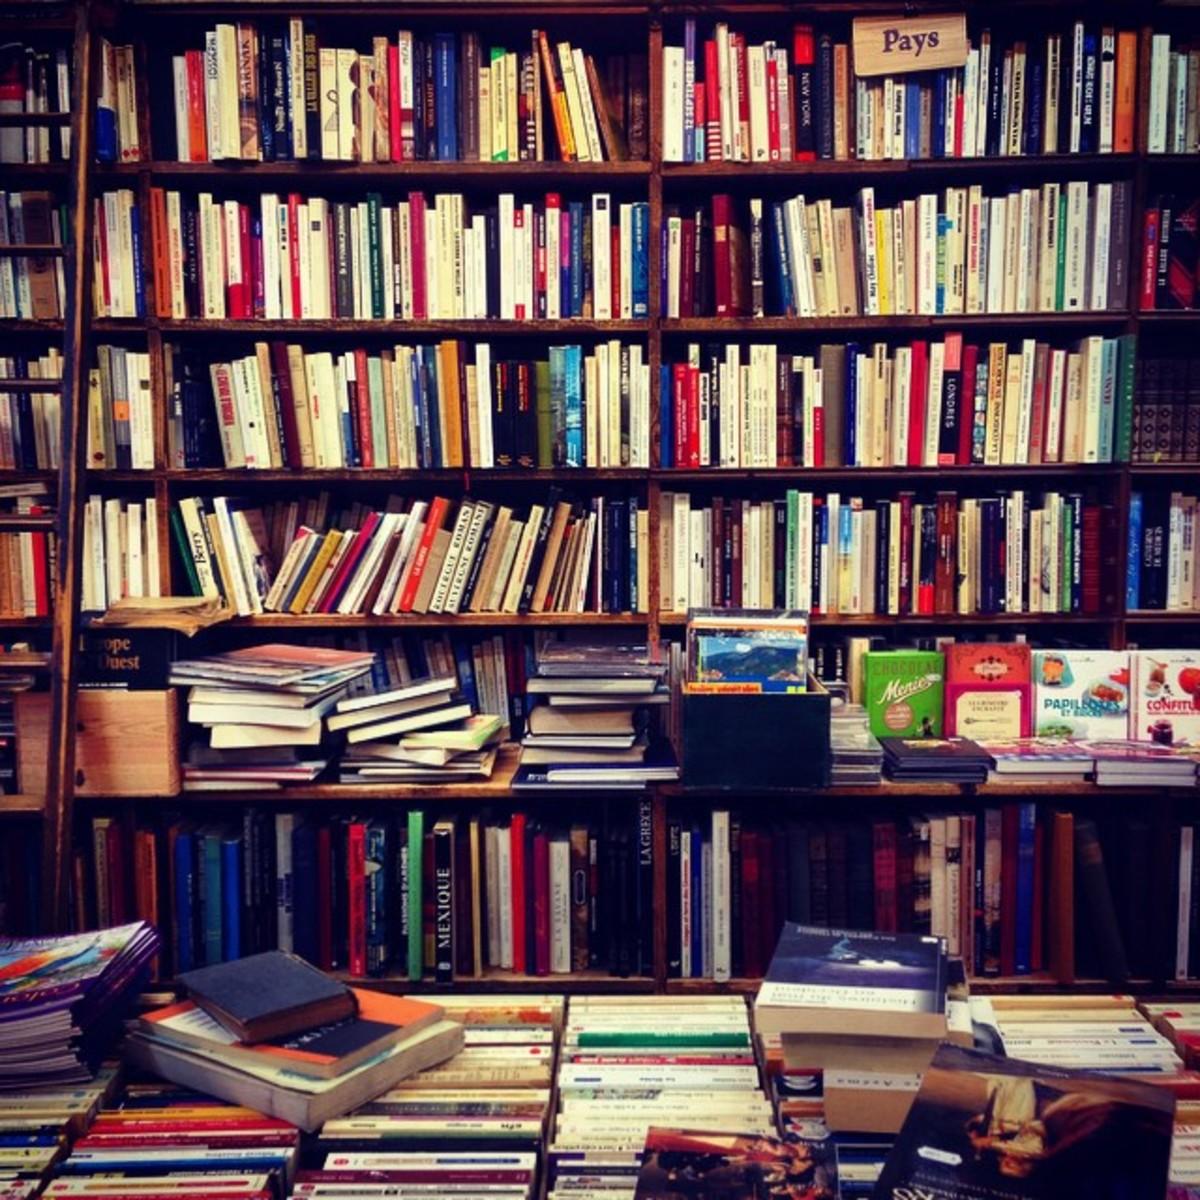 Shelf of text books